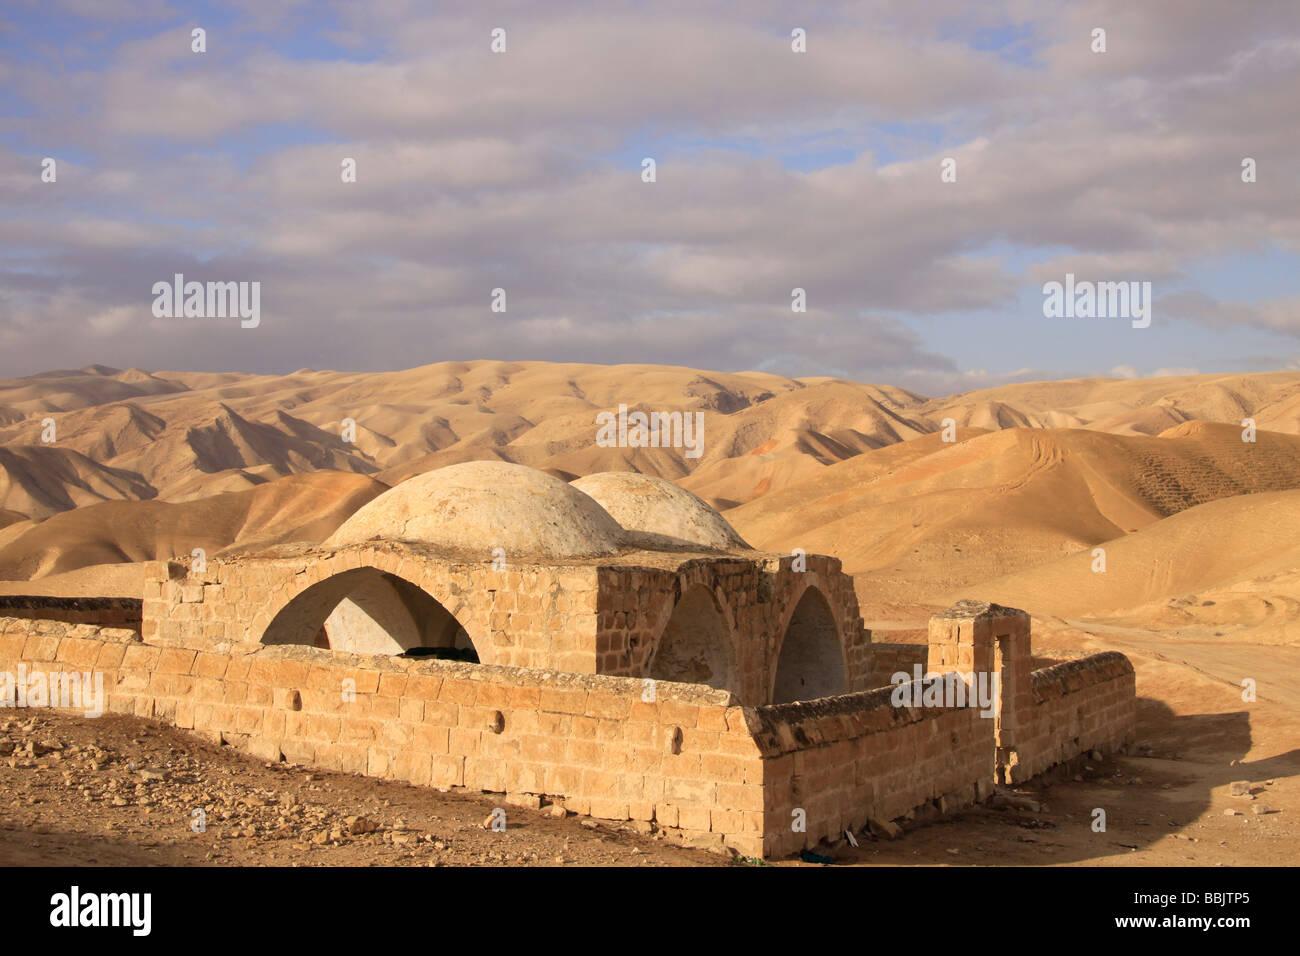 Maqam Hasan al Rai near Nabi Musa - Stock Image